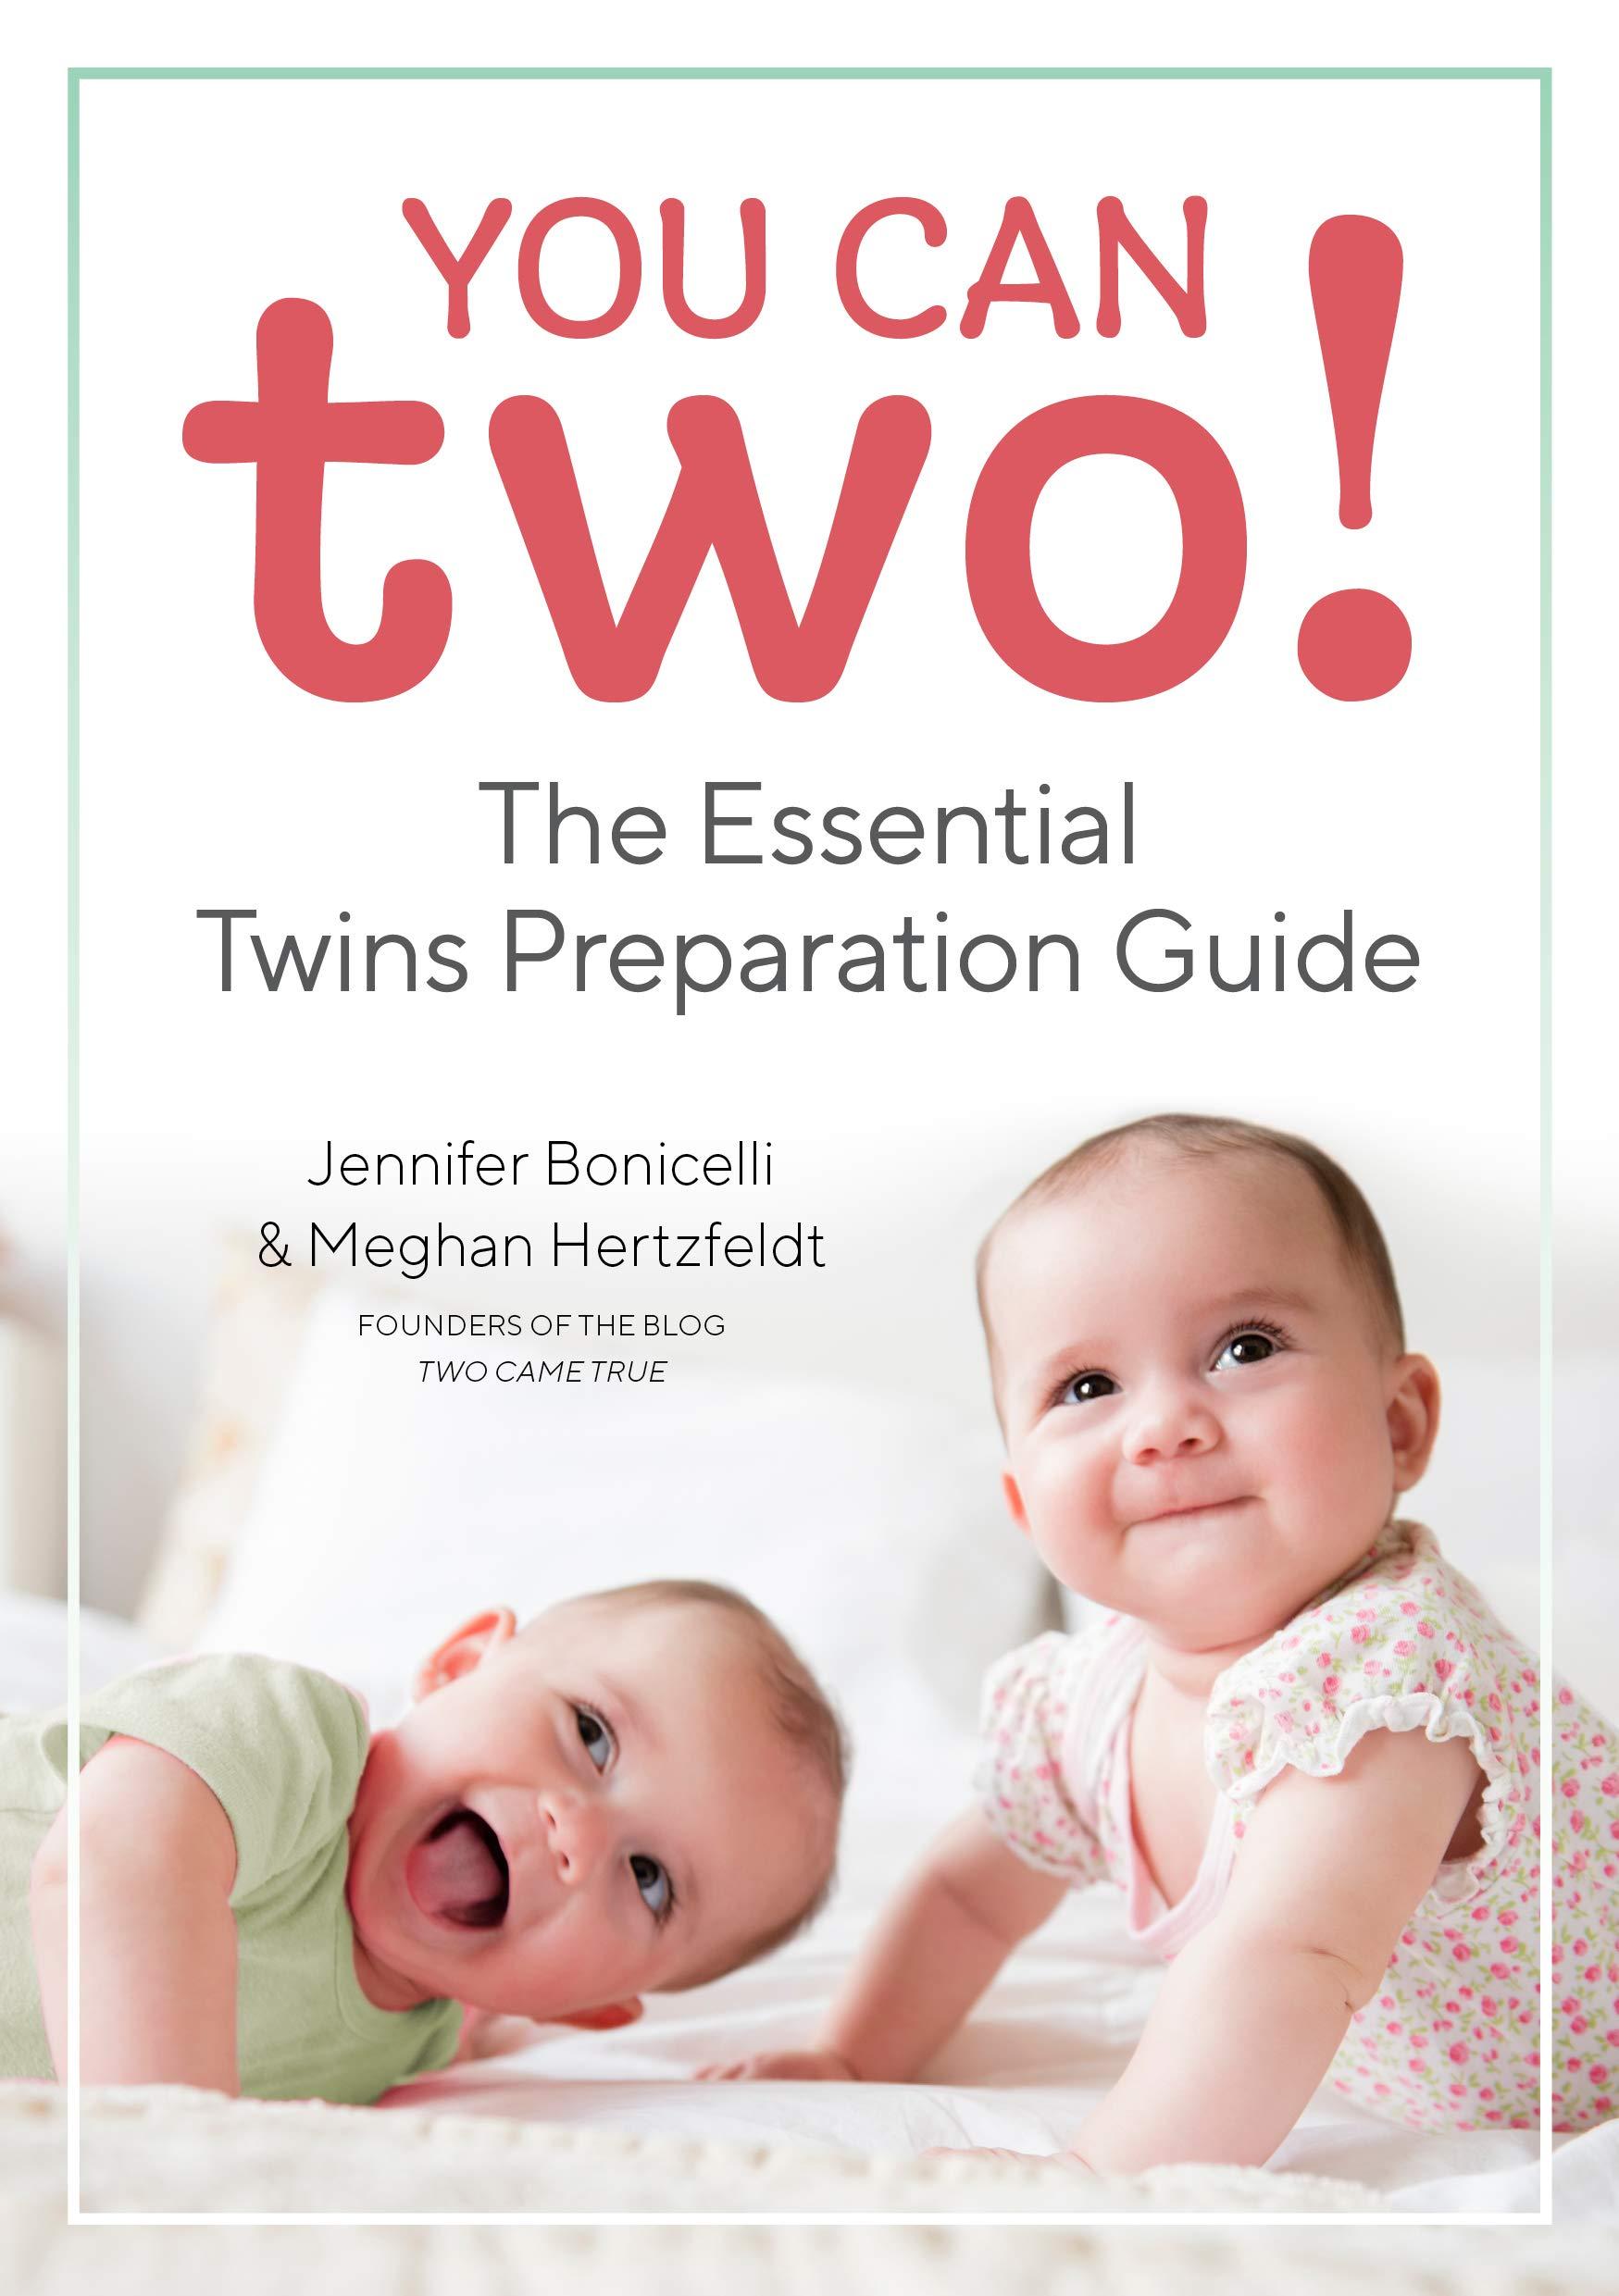 The Essential Twins Preparation Guide: Amazon.co.uk: Jennifer Bonicelli,  Meghan Hertzfeldt: 9781641521789: Books